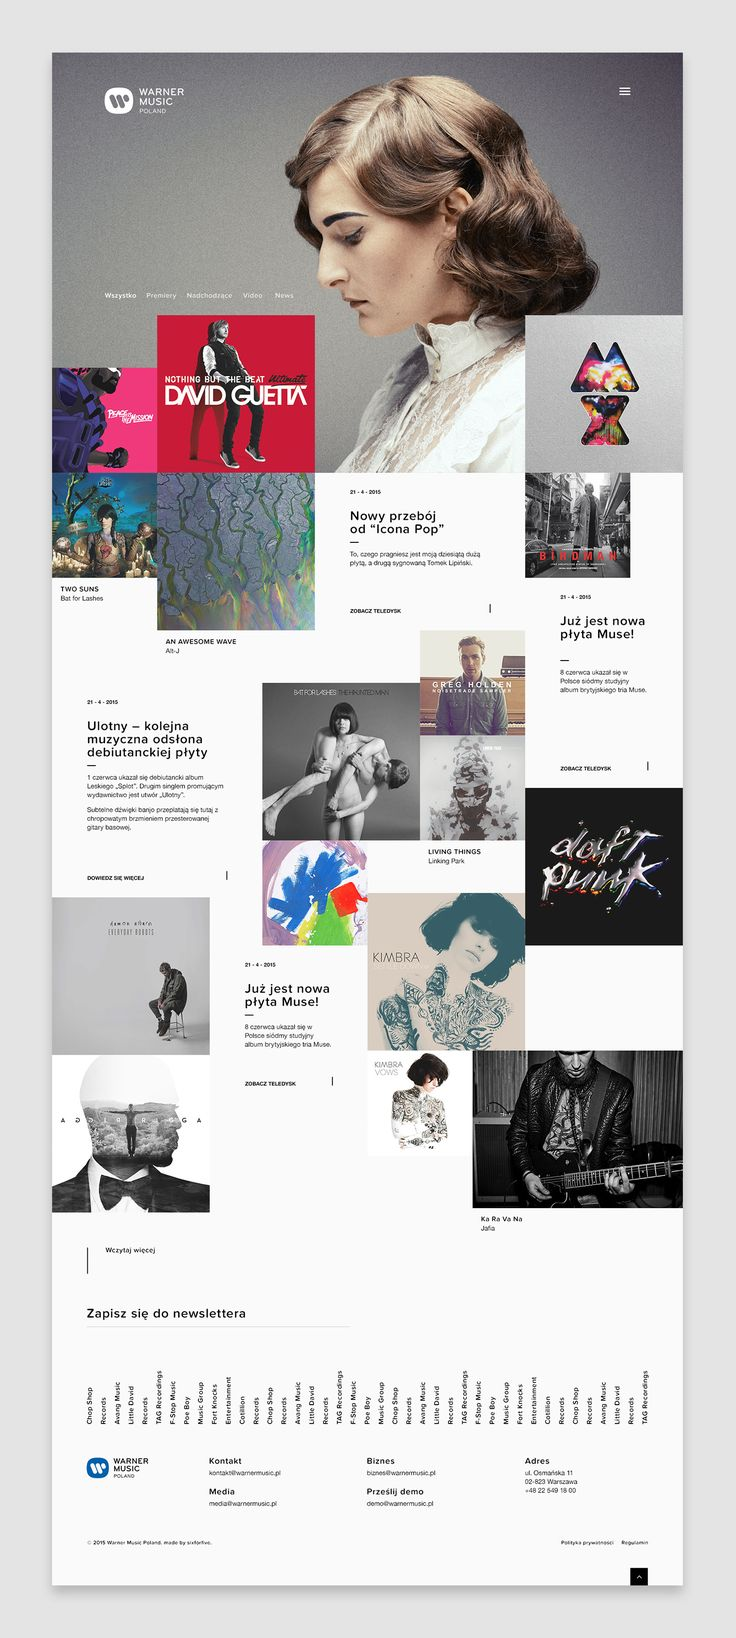 Warner Music Poland on Behance